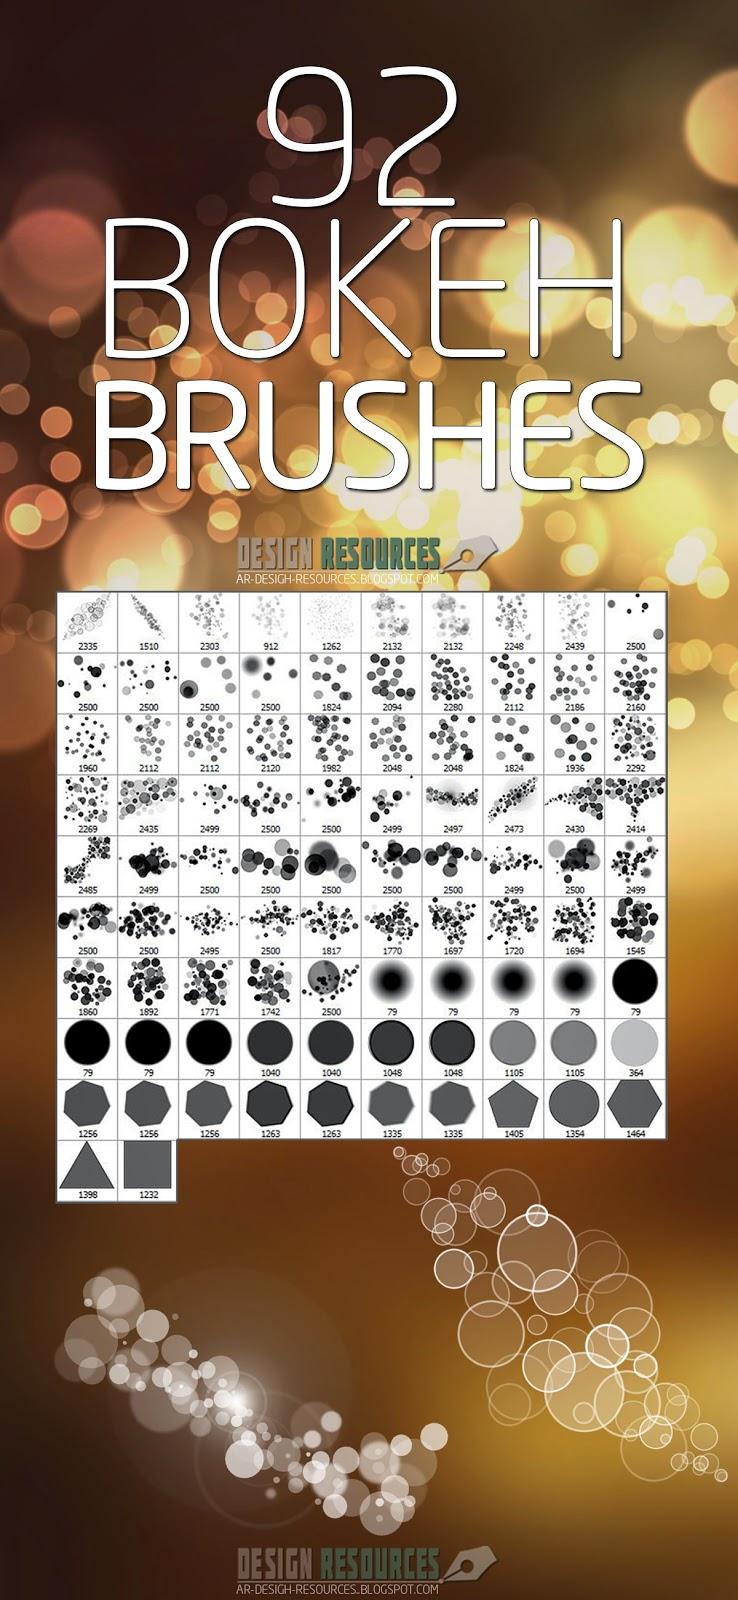 http://1.bp.blogspot.com/-qooMnyq9kak/VFzvWbR-5NI/AAAAAAAABEc/ksFxiwjdcqY/s1600/92_Bokeh-Brushes_Ar-Design-Resources_Preview.jpg